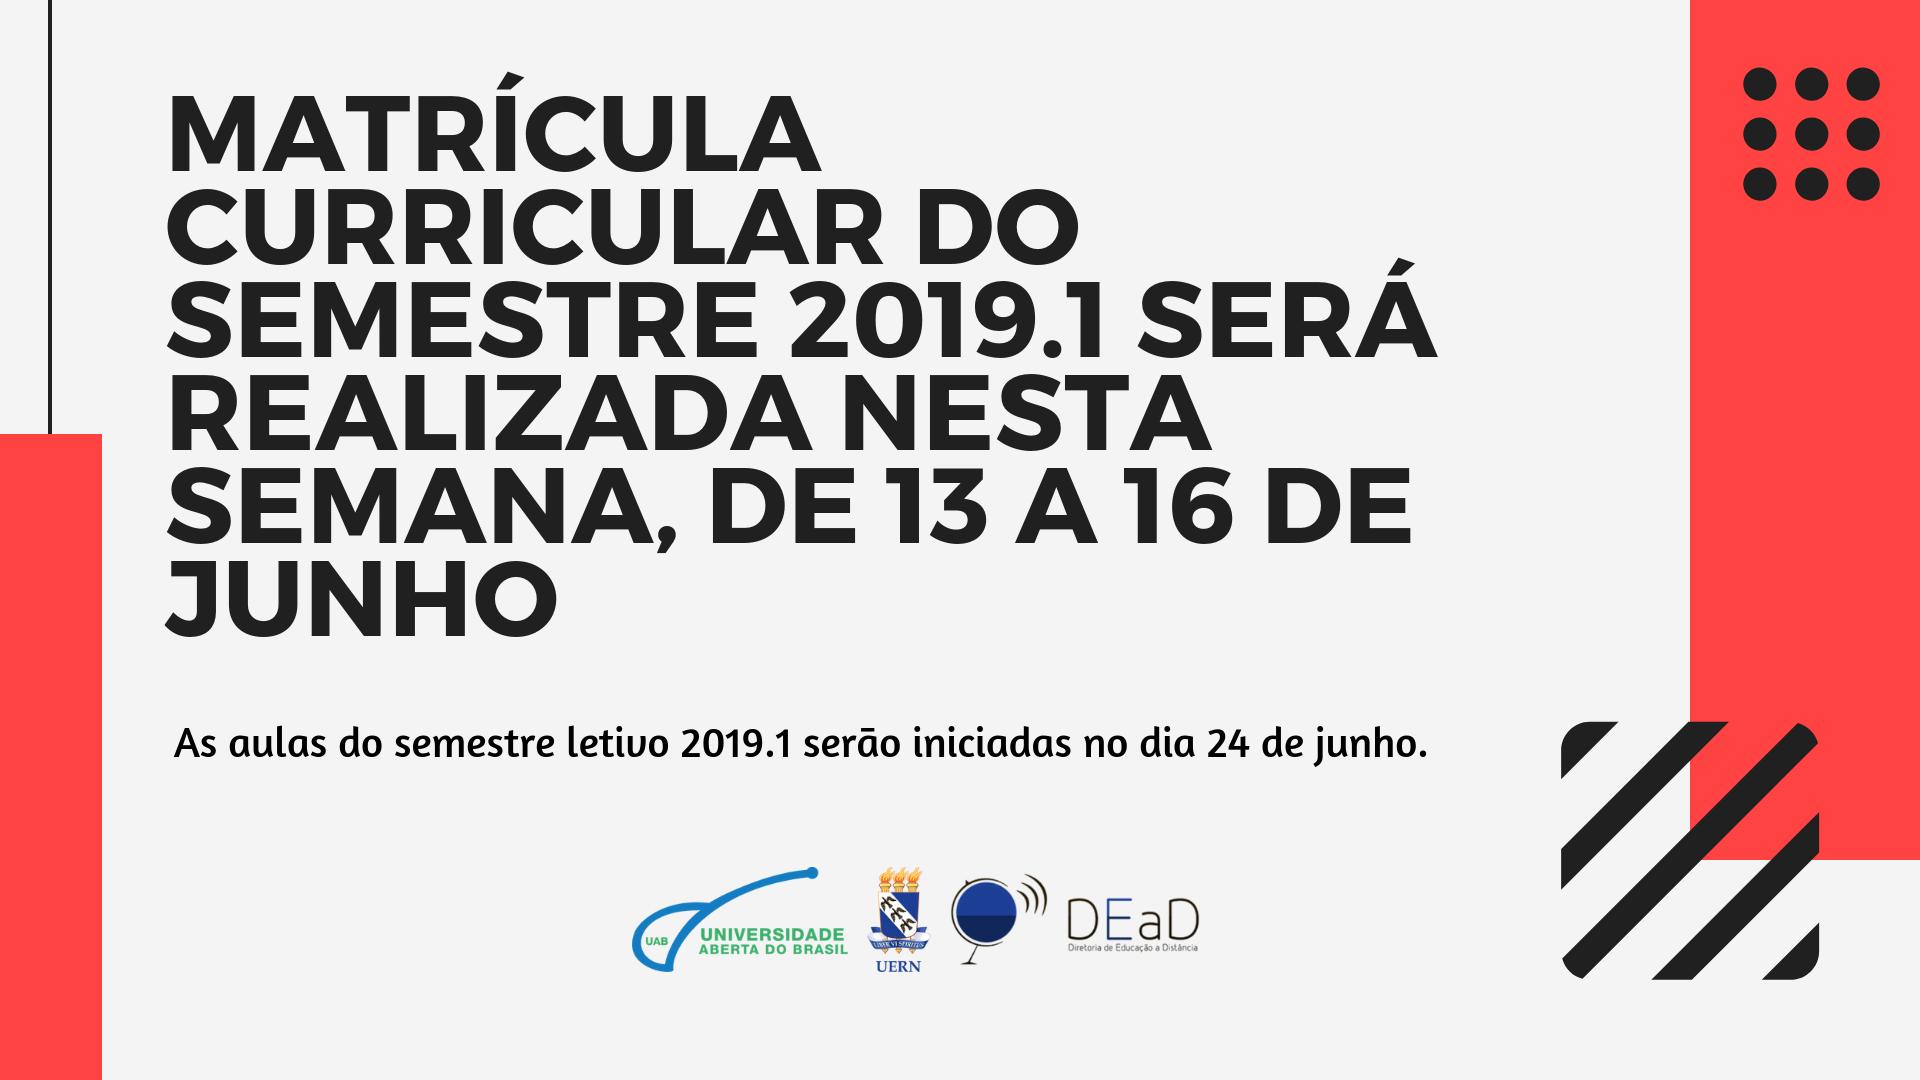 Matrícula curricular do semestre 2019.1 será realizada nesta semana, de 13 a 16 de junho